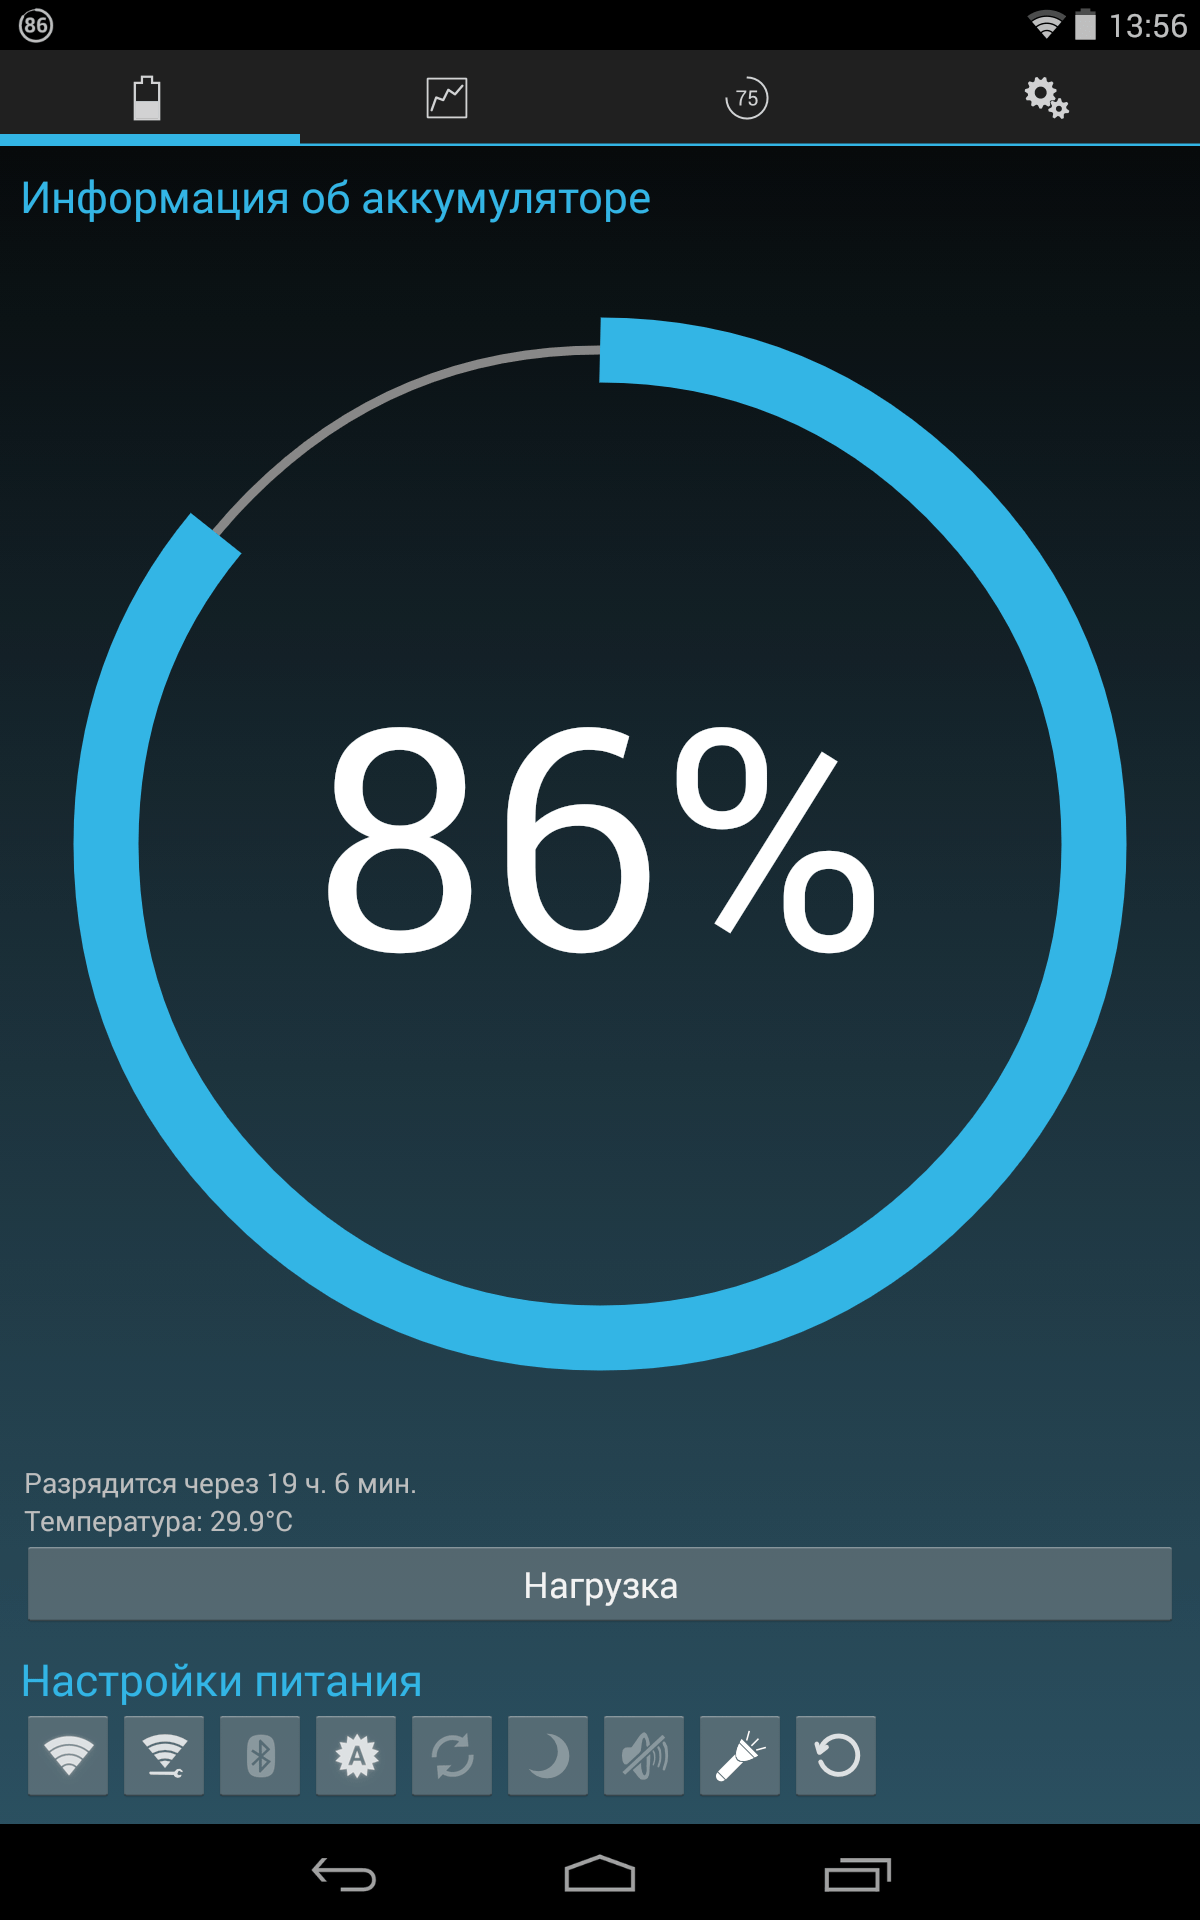 Андроид как сделать заряд батареи в процентах на 550